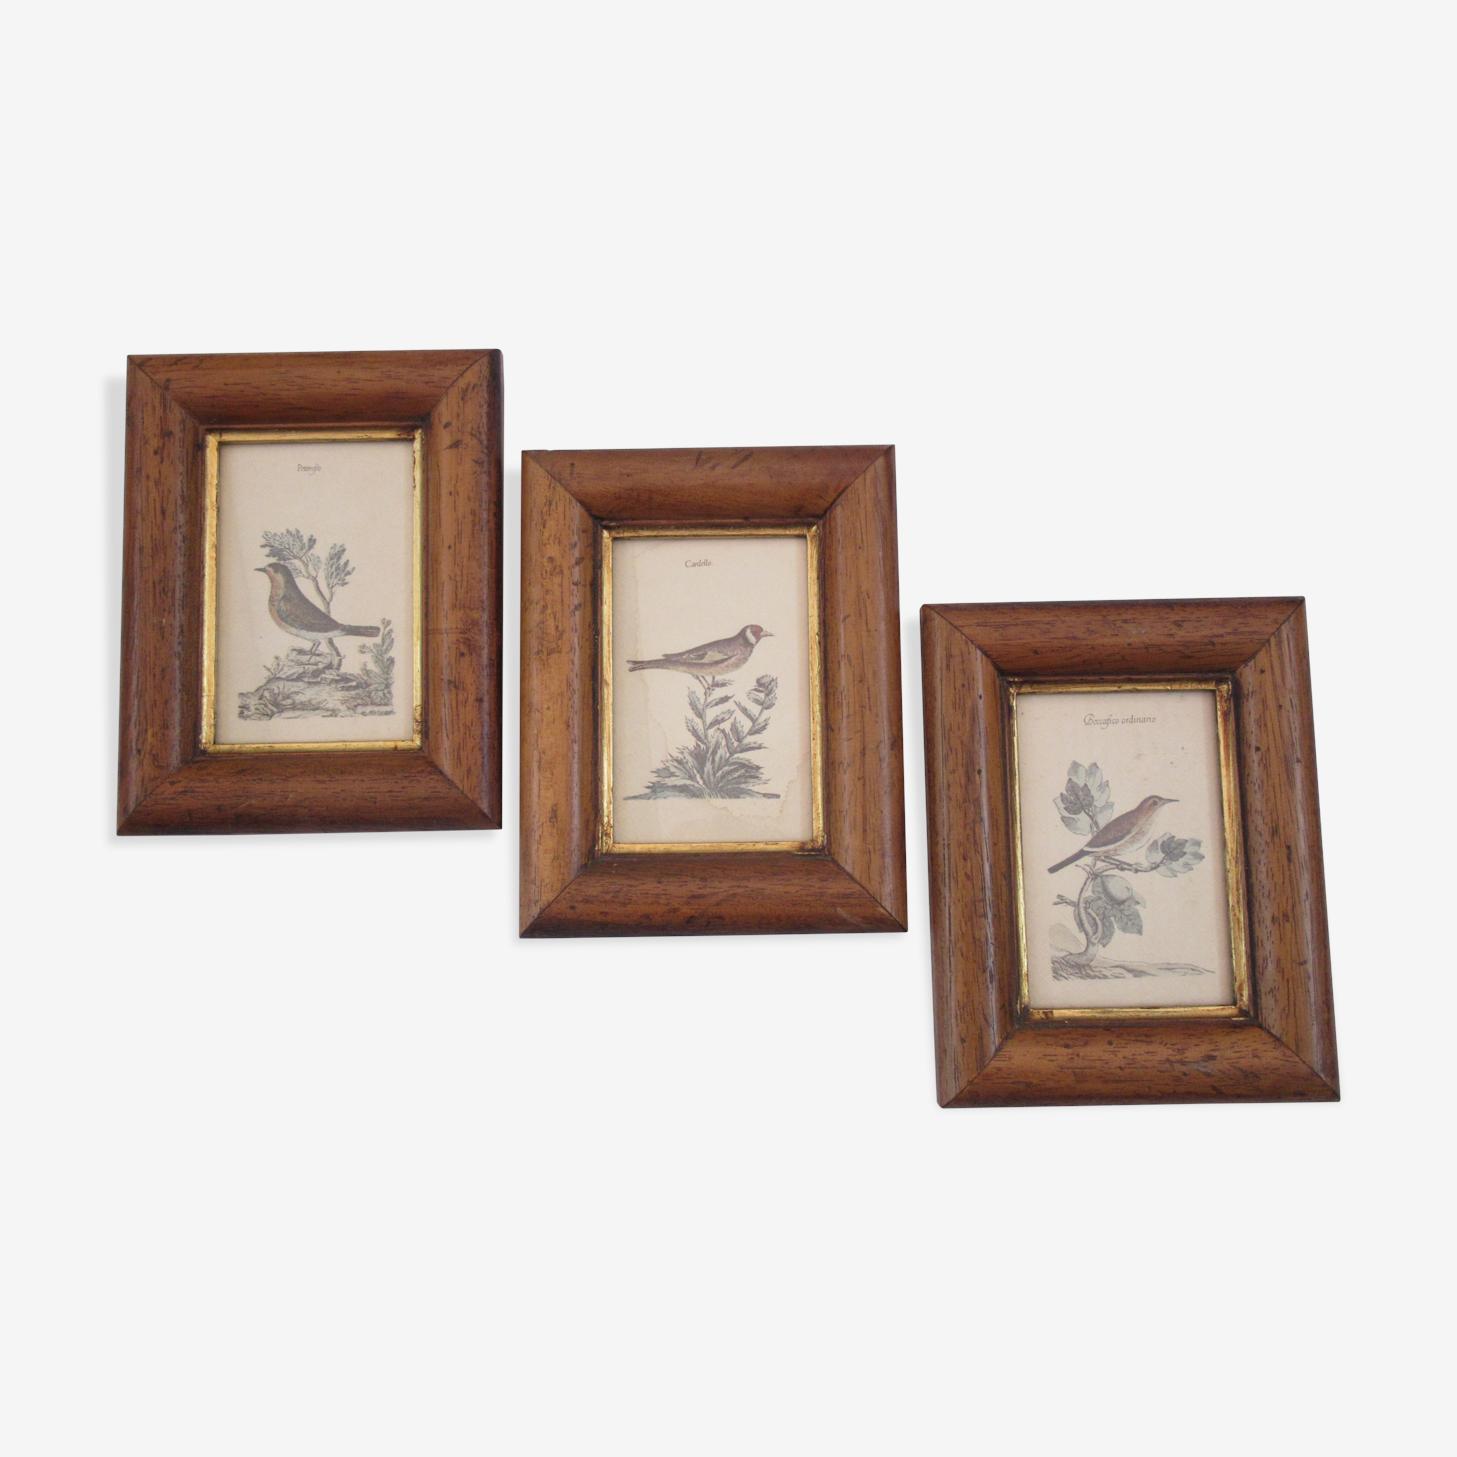 Three bird frames